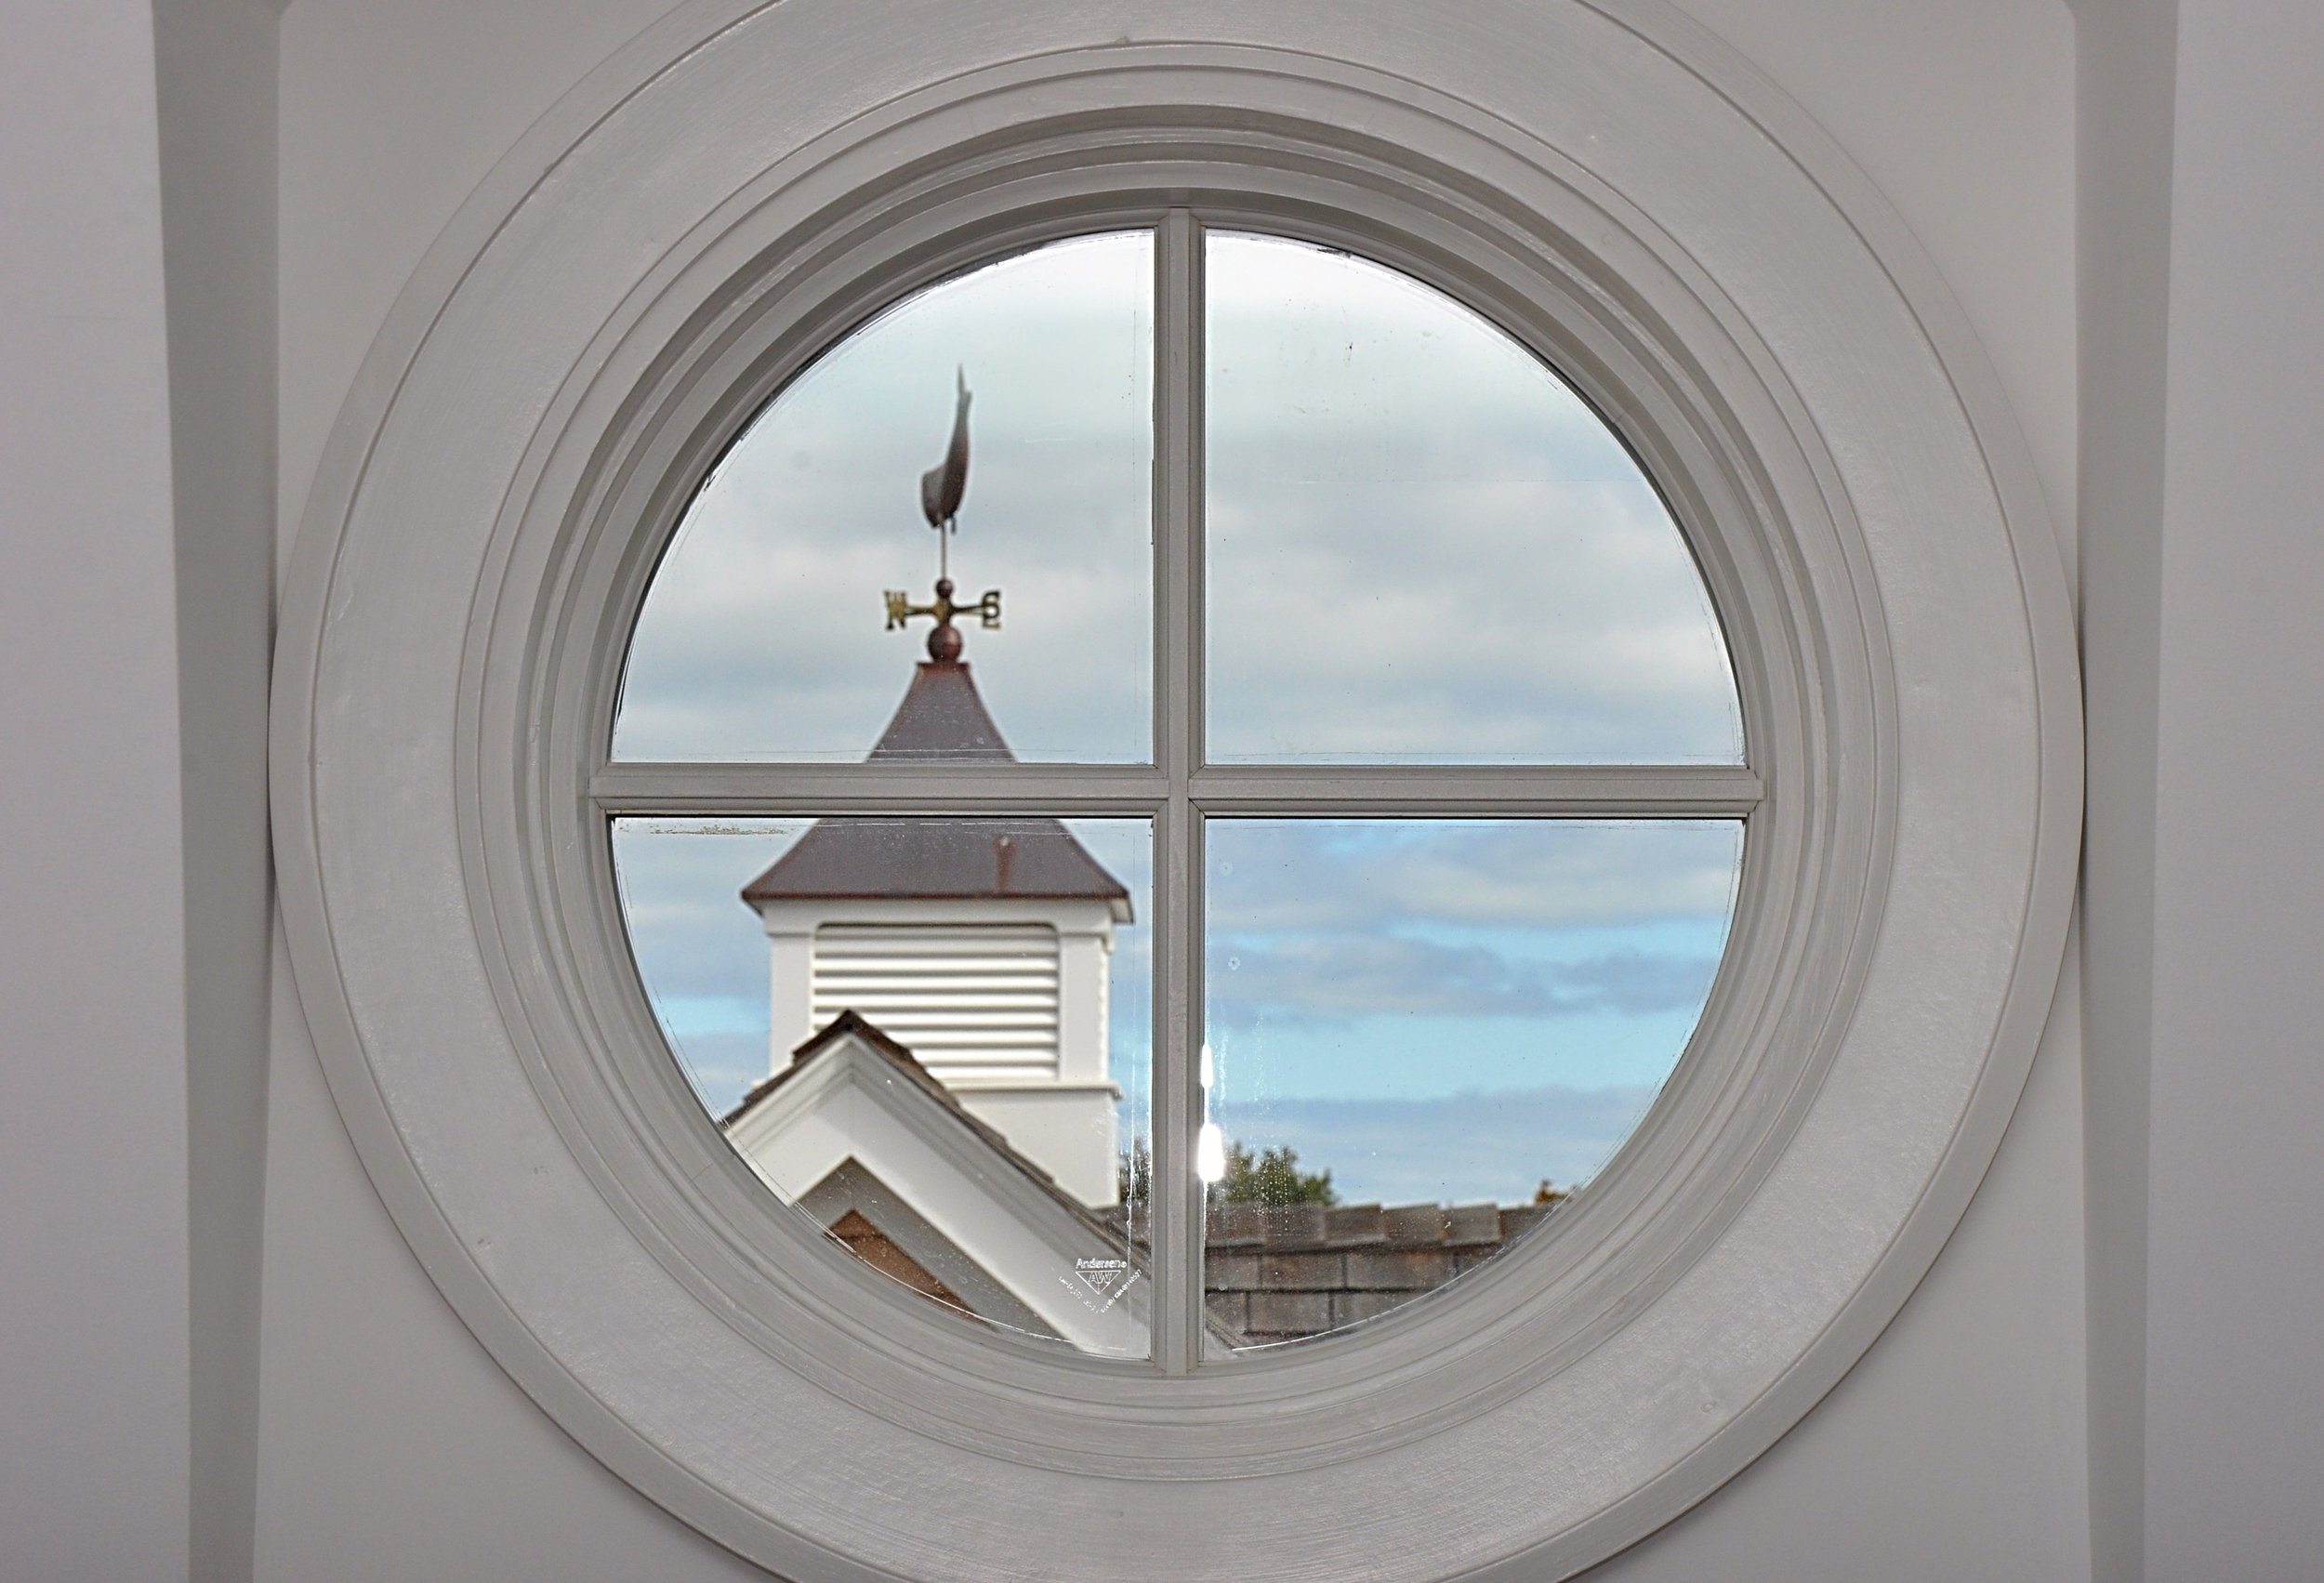 Porthole_Window_Portico_Weather_Vane.jpg